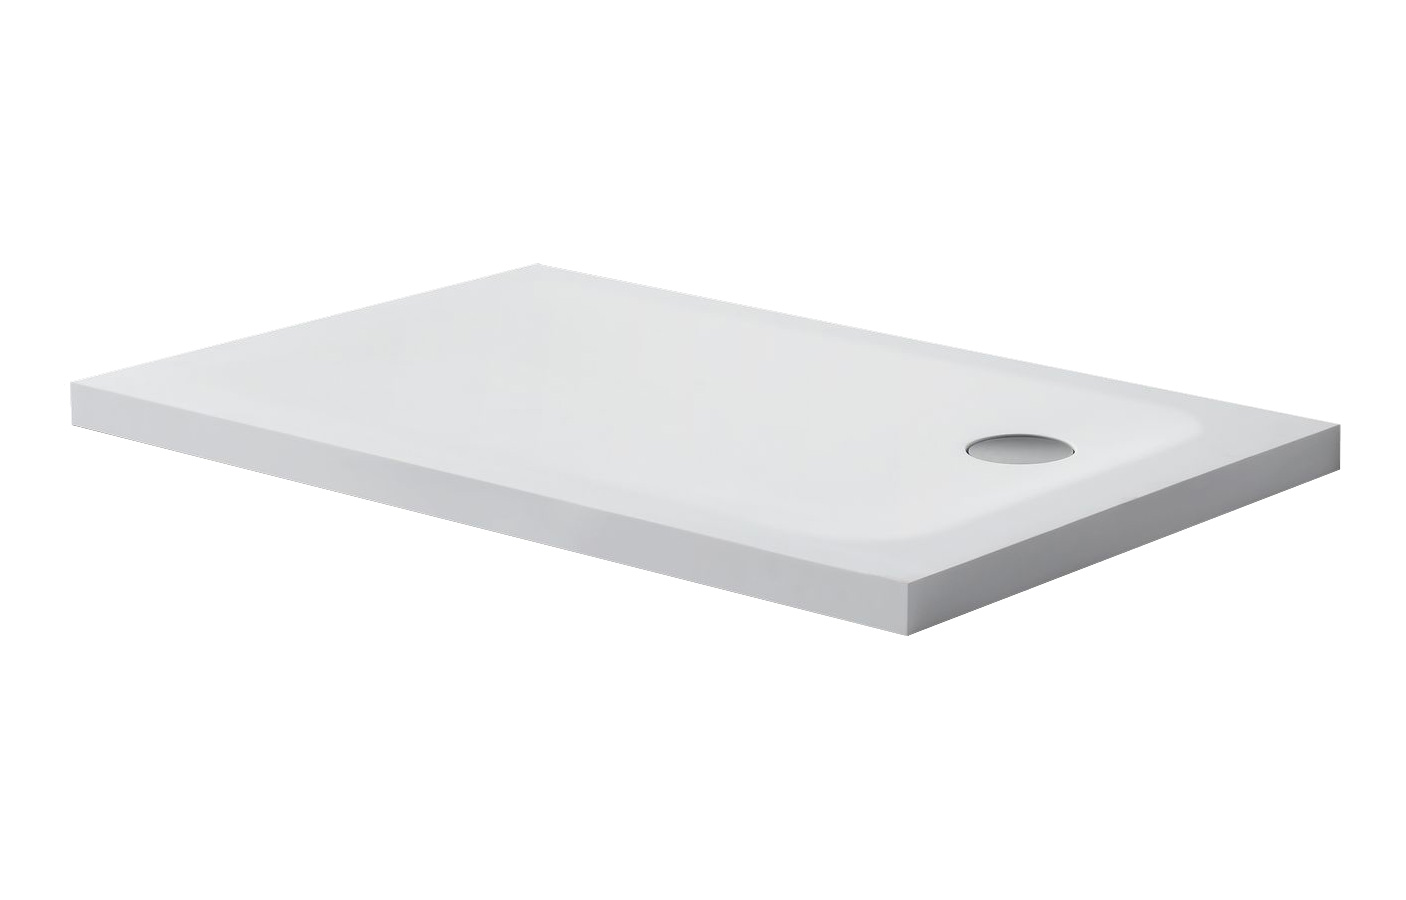 Solid surface douchebak rechthoek model